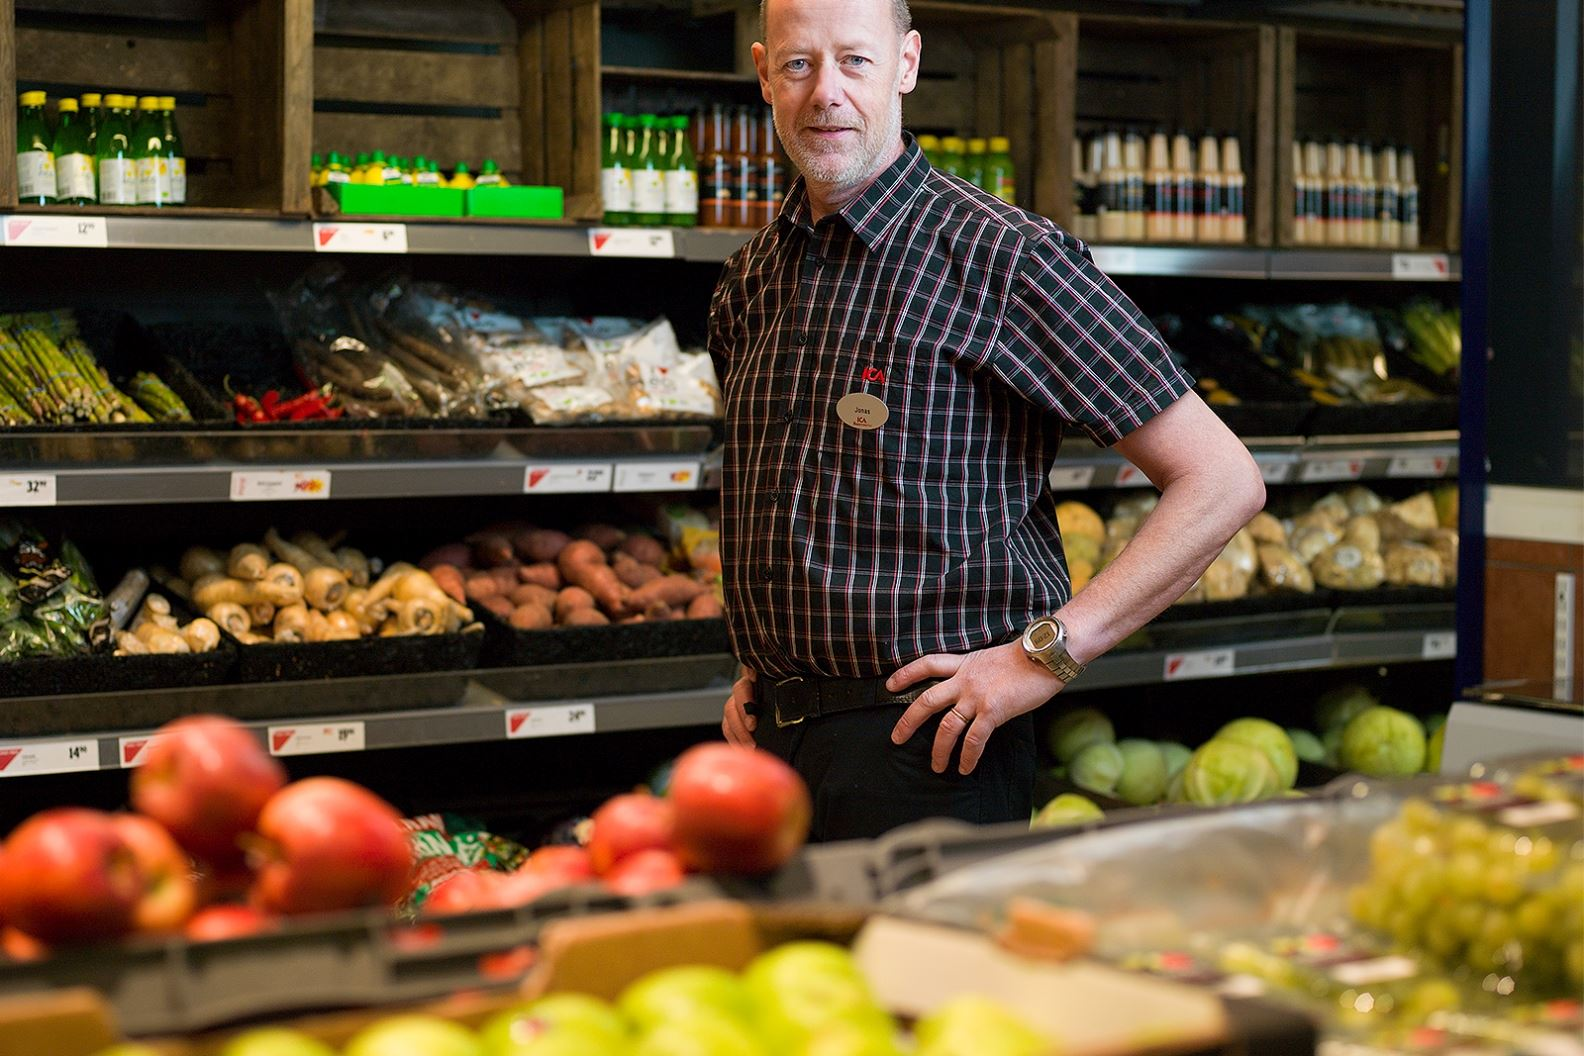 Anna Sköld, Ica Supermarket - Jonas Hugosson